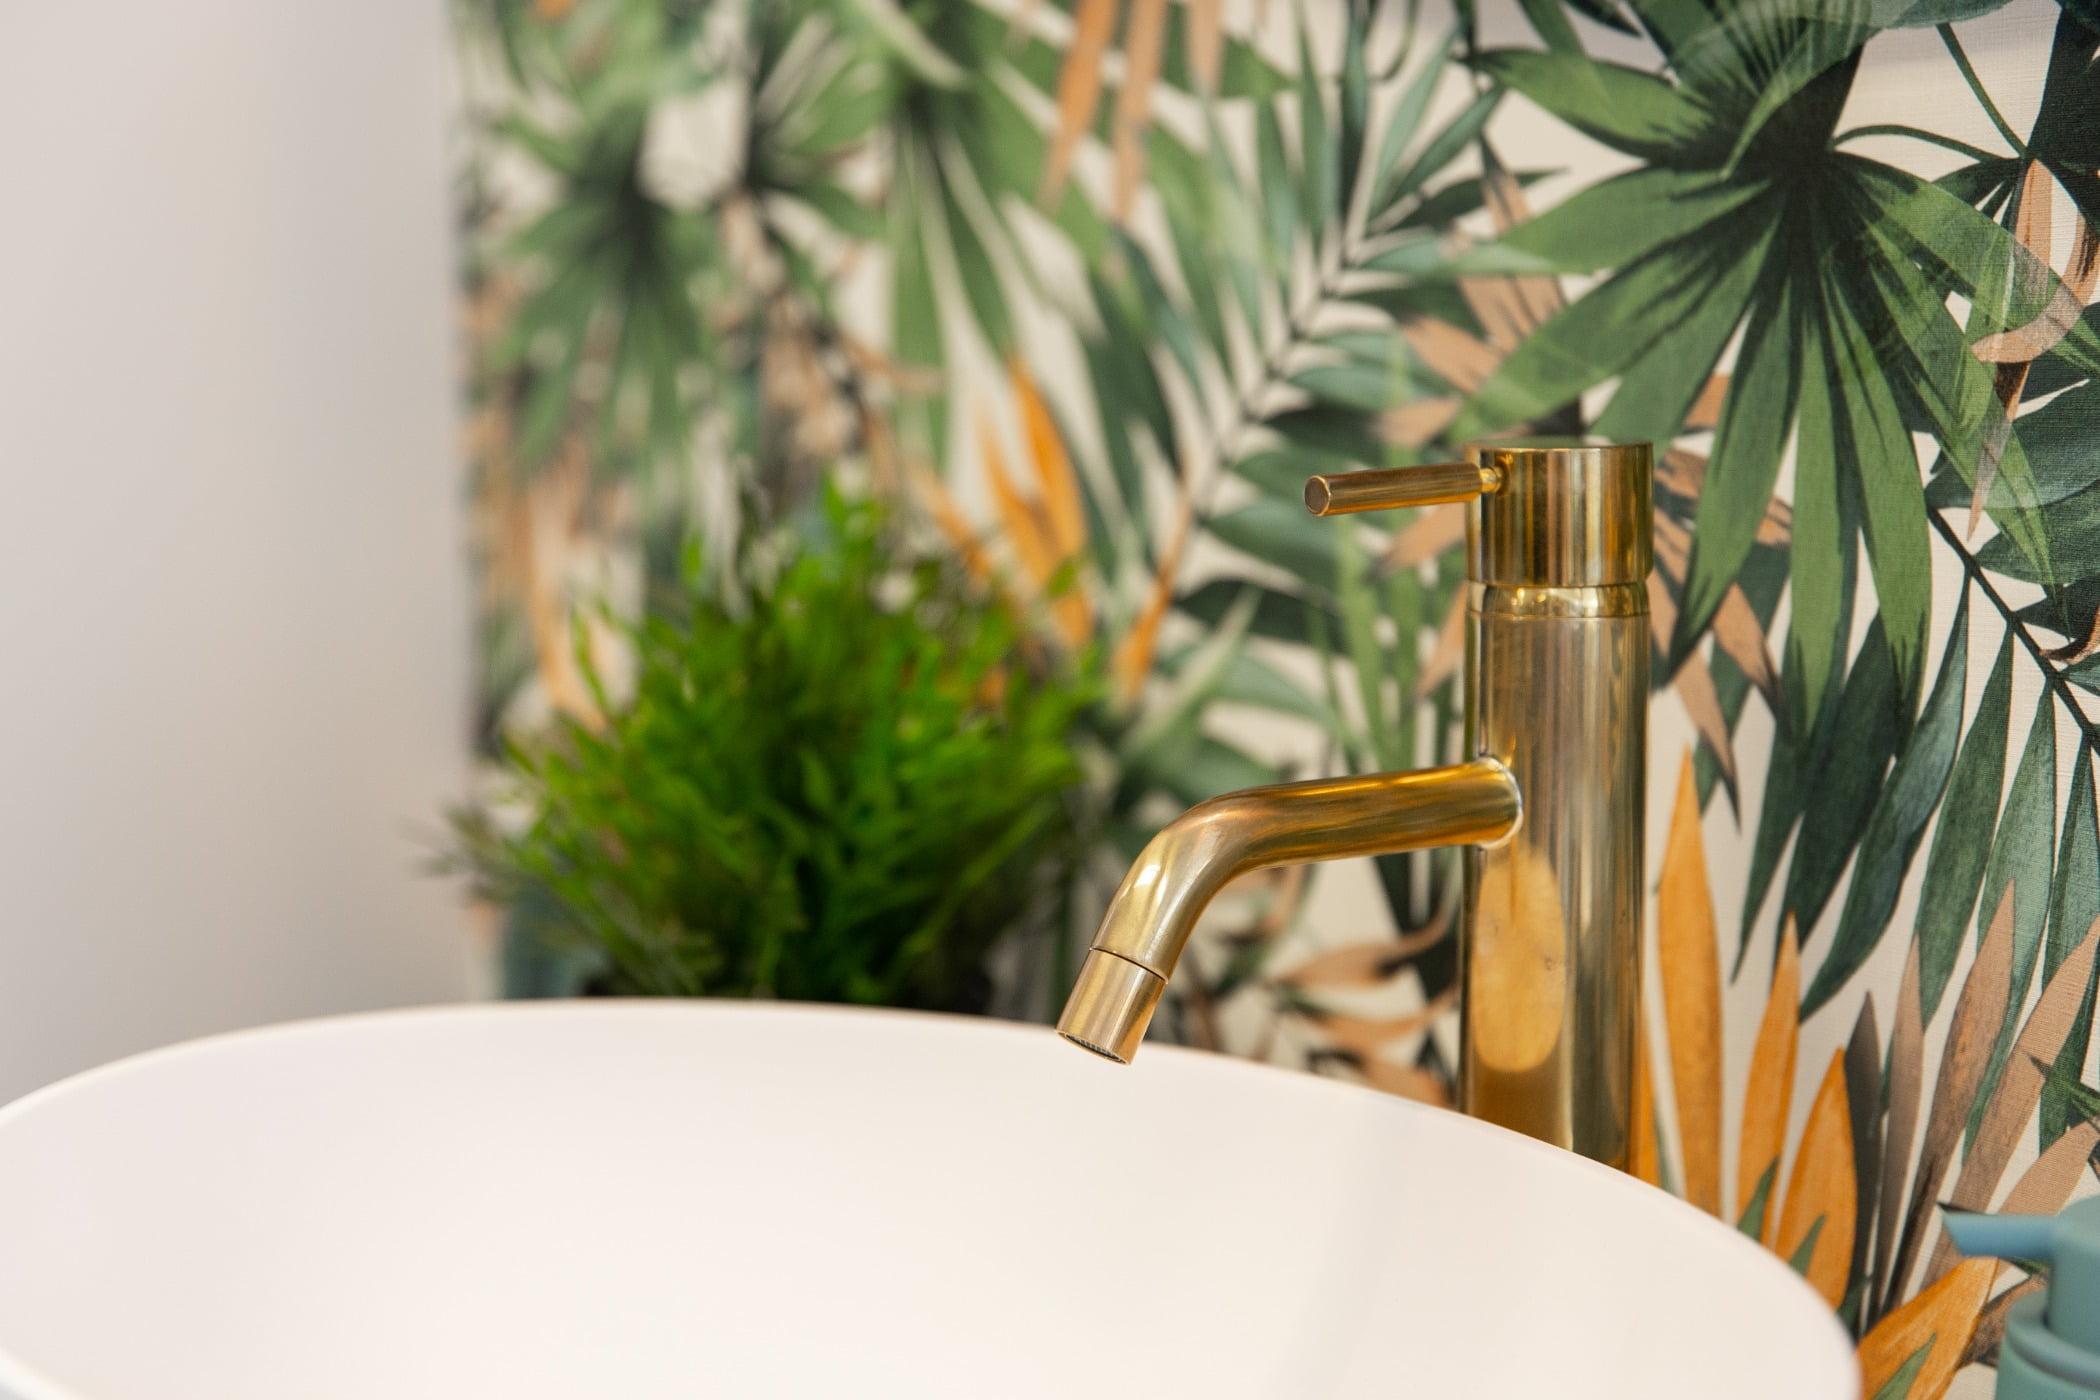 Terrestrial plant, Leaf, Dishware, Wood, Tablecloth, Twig, Grass, Tableware, Rectangle